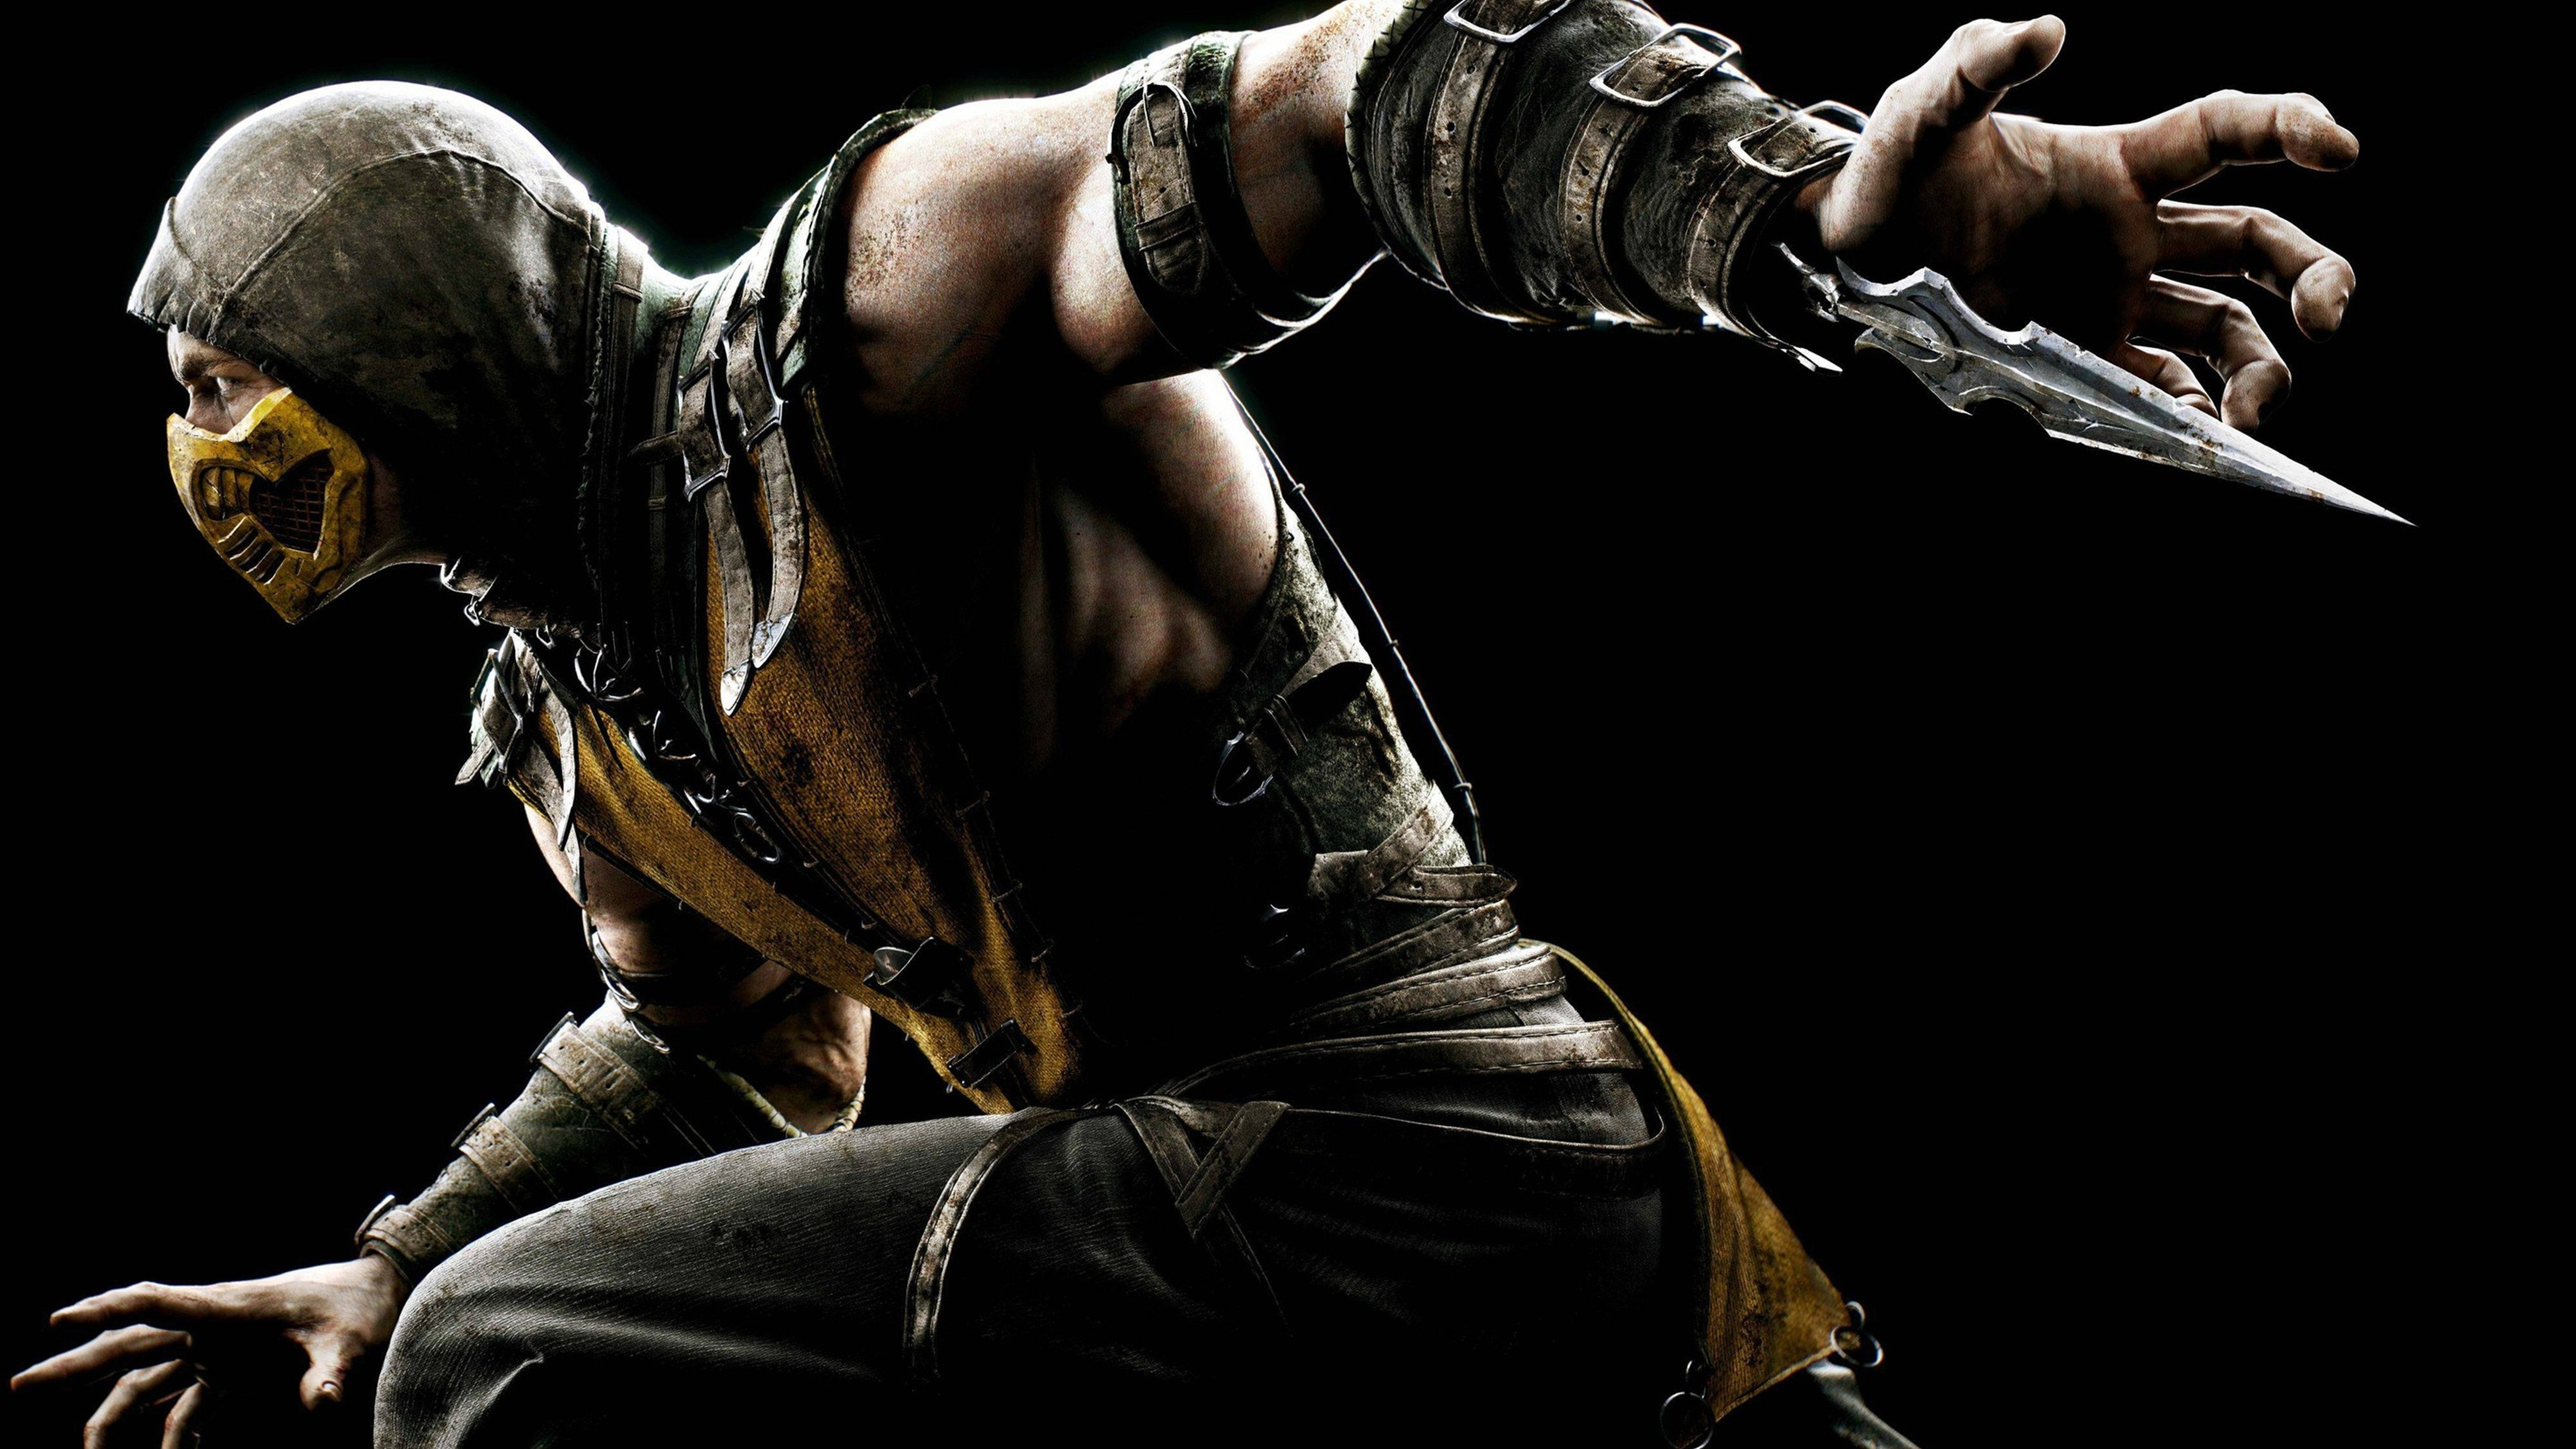 Mortal Kombat X Shaolin trailer [PS3/PS4/Xbox 360/Xbox One/PC]    Gameplayaholic   Pinterest   Mortal kombat and Xbox